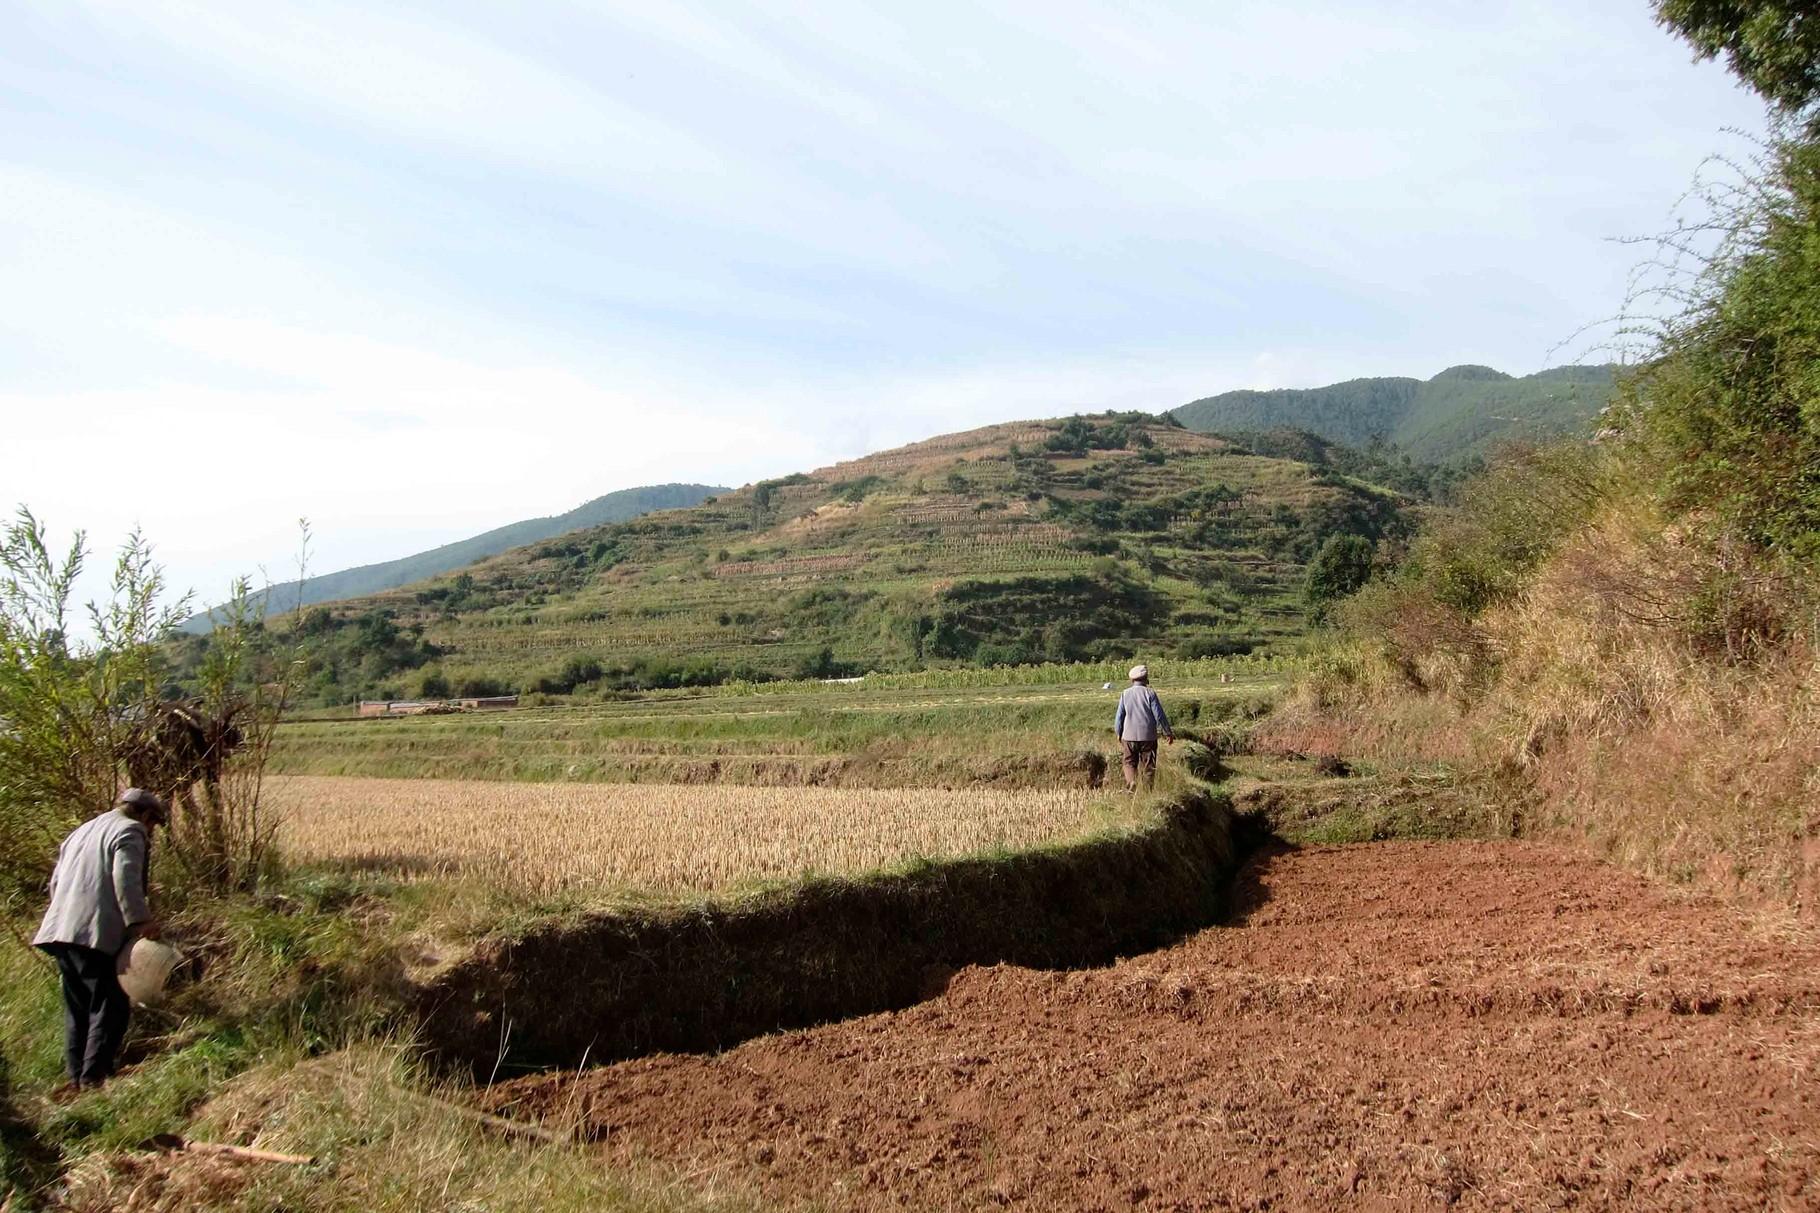 Fahrrad-Tour entlang der Shaxi Bauerndörfer